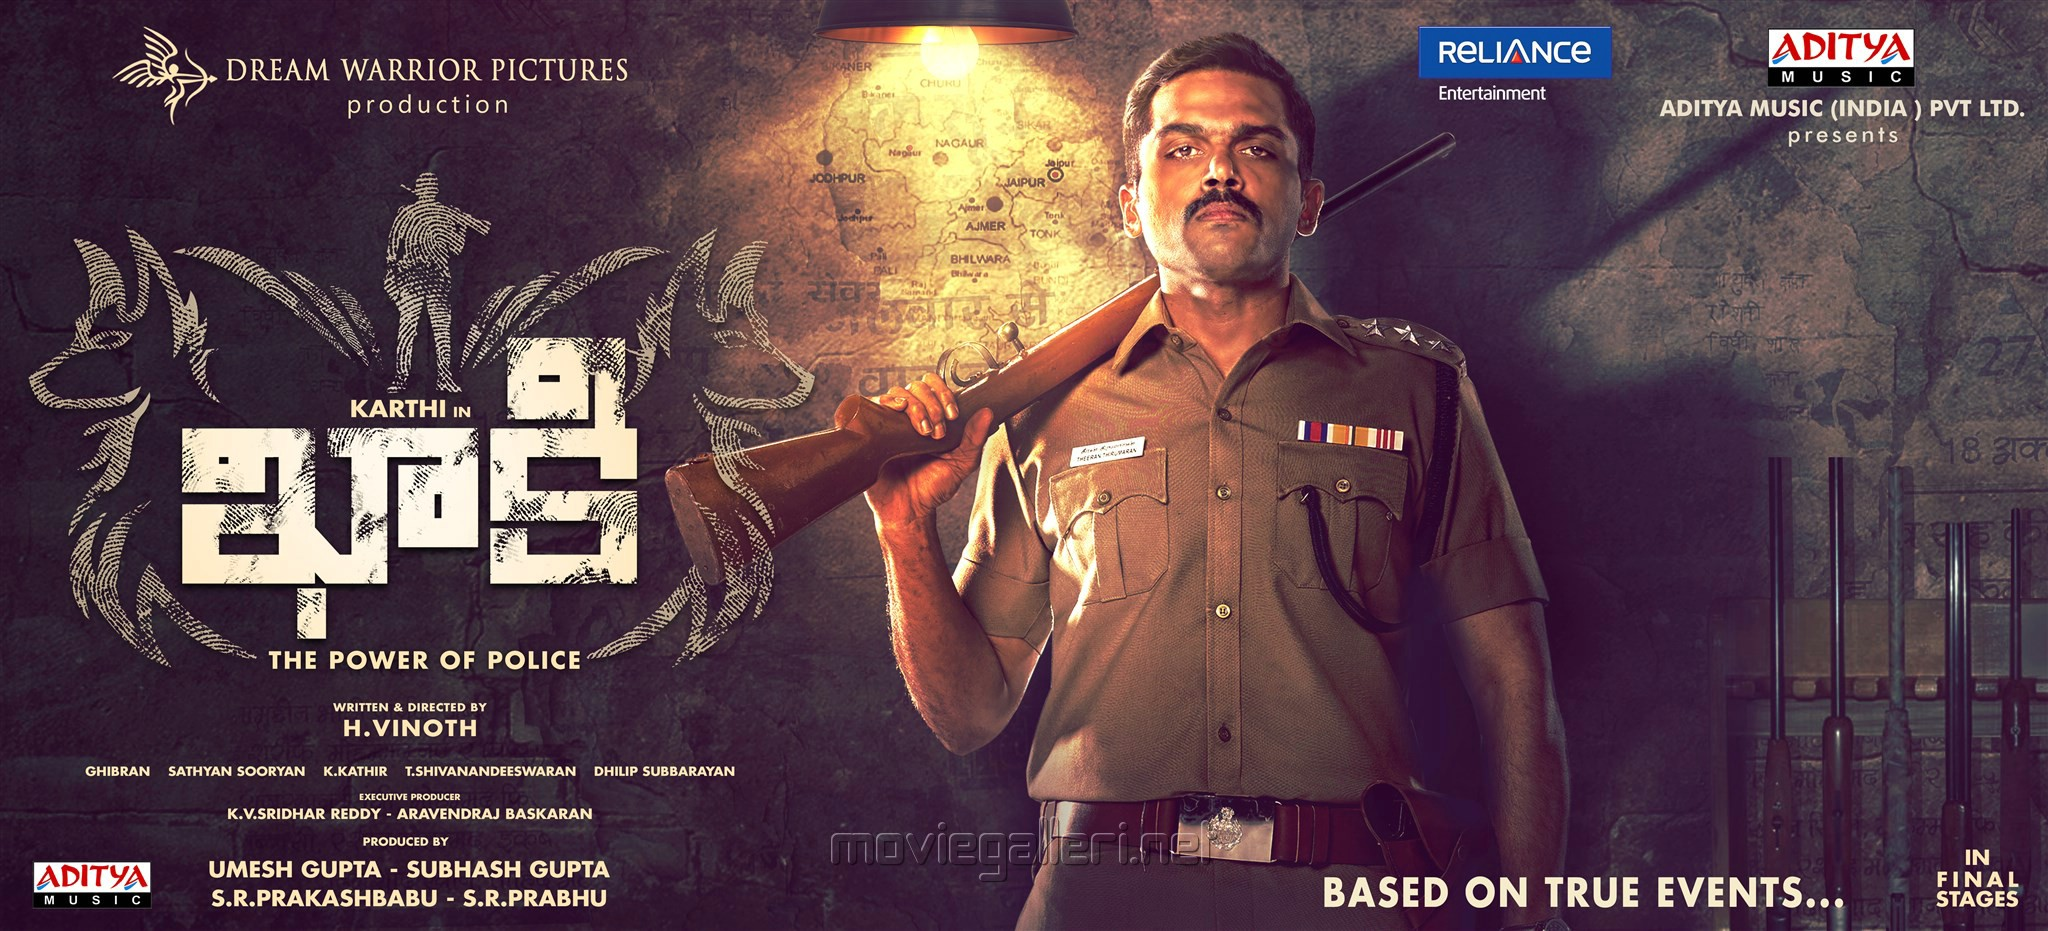 Actor Karthi Khaki Telugu Movie Wallpaper